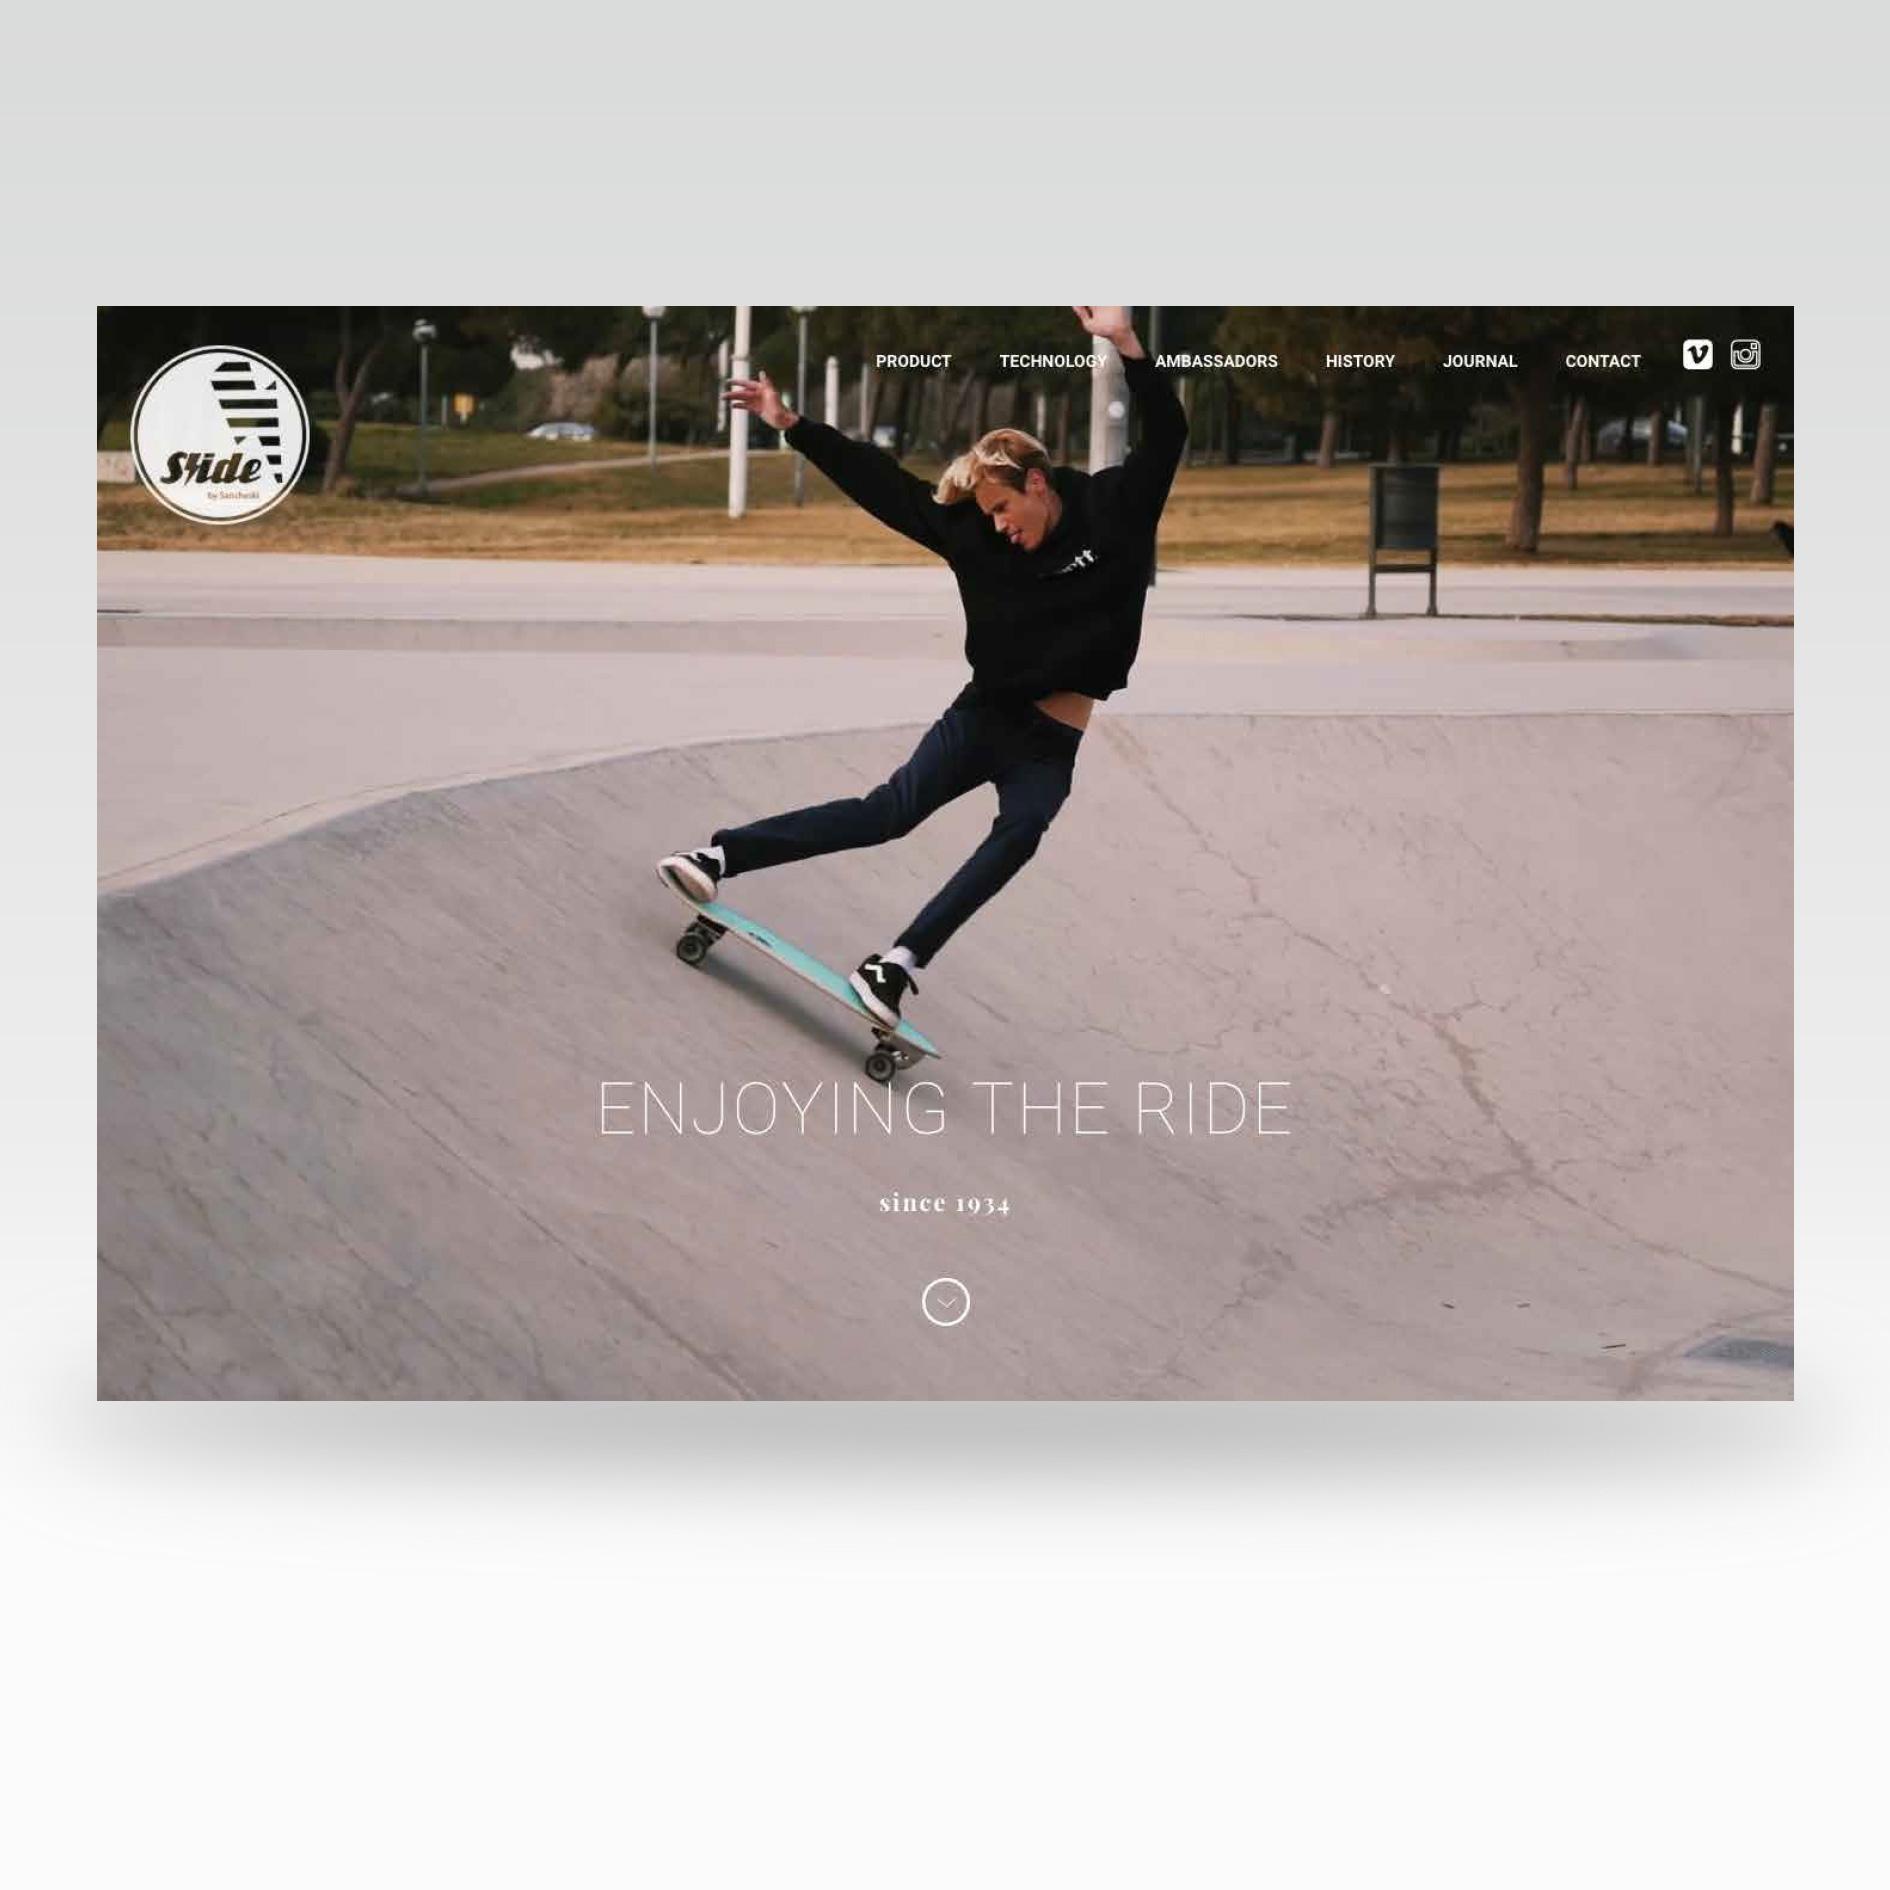 Diseño web Slide